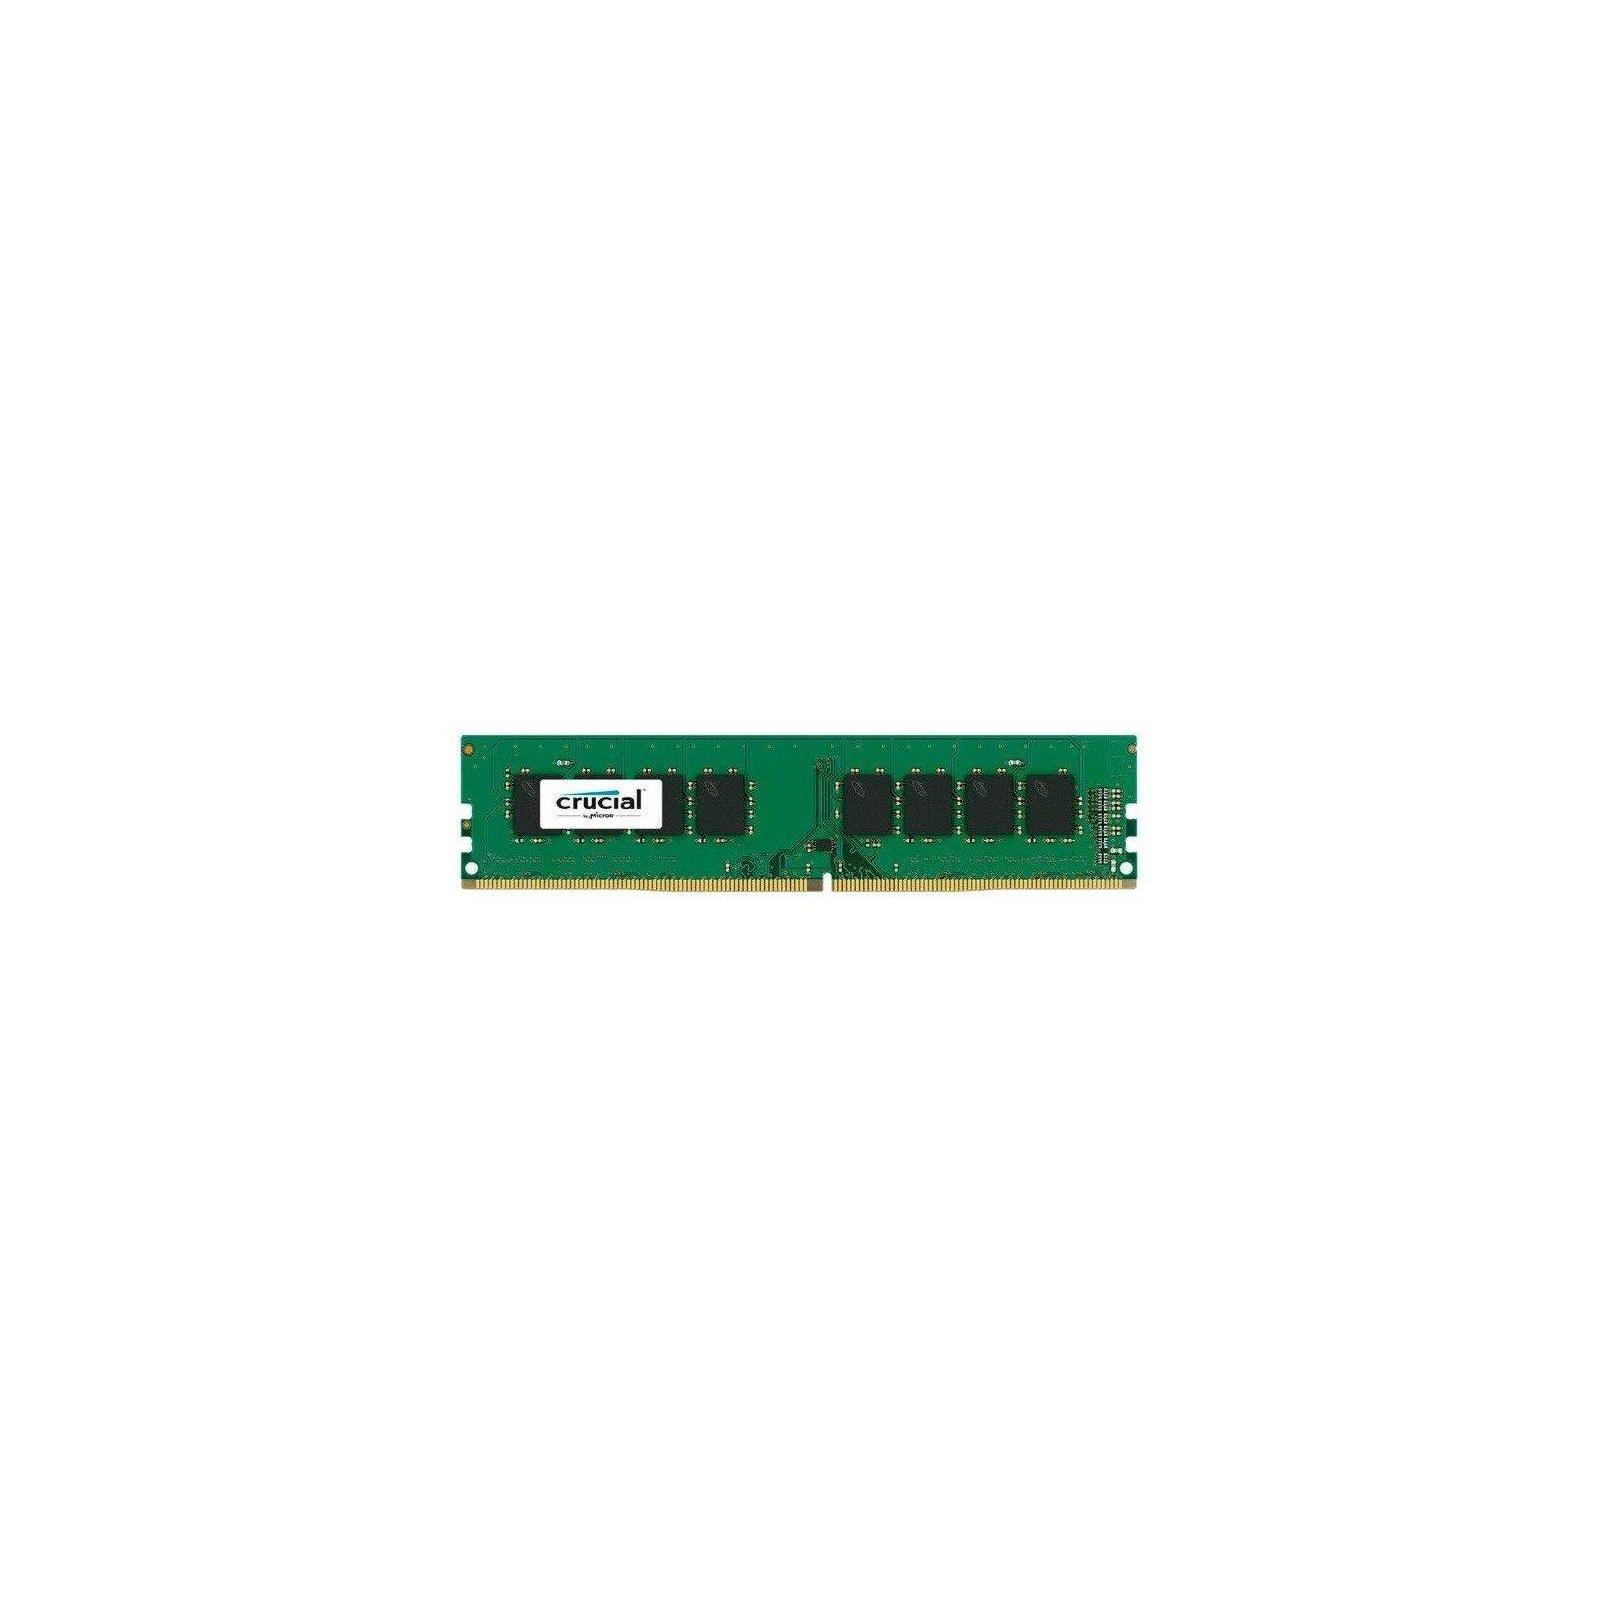 Модуль памяти для компьютера DDR4 4GB 2666 MHz MICRON (CT4G4DFS8266)